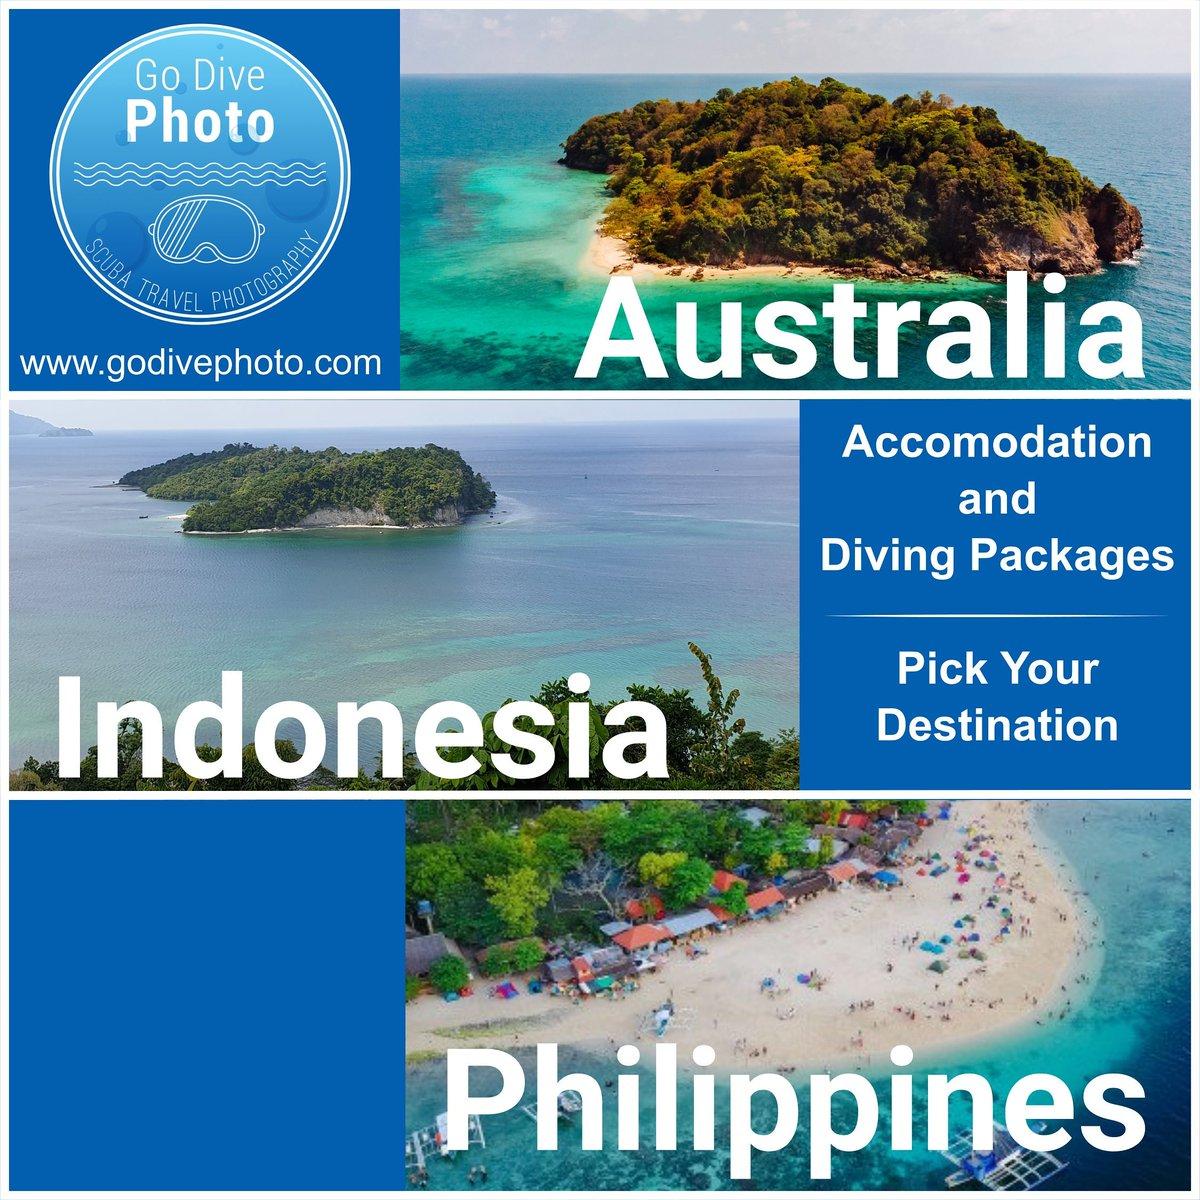 Lets Go Diving.. Pick your destination  For more info see website http://www.godivephoto.com  #scuba #scubadivingtrip #scubatravel #scubalife #scubaadventures #divingtrip #divingaustralia #divingindonesia #divingphilippines #divingtravel #travel #traveladdict #travelphotographypic.twitter.com/21EdCMQNYe